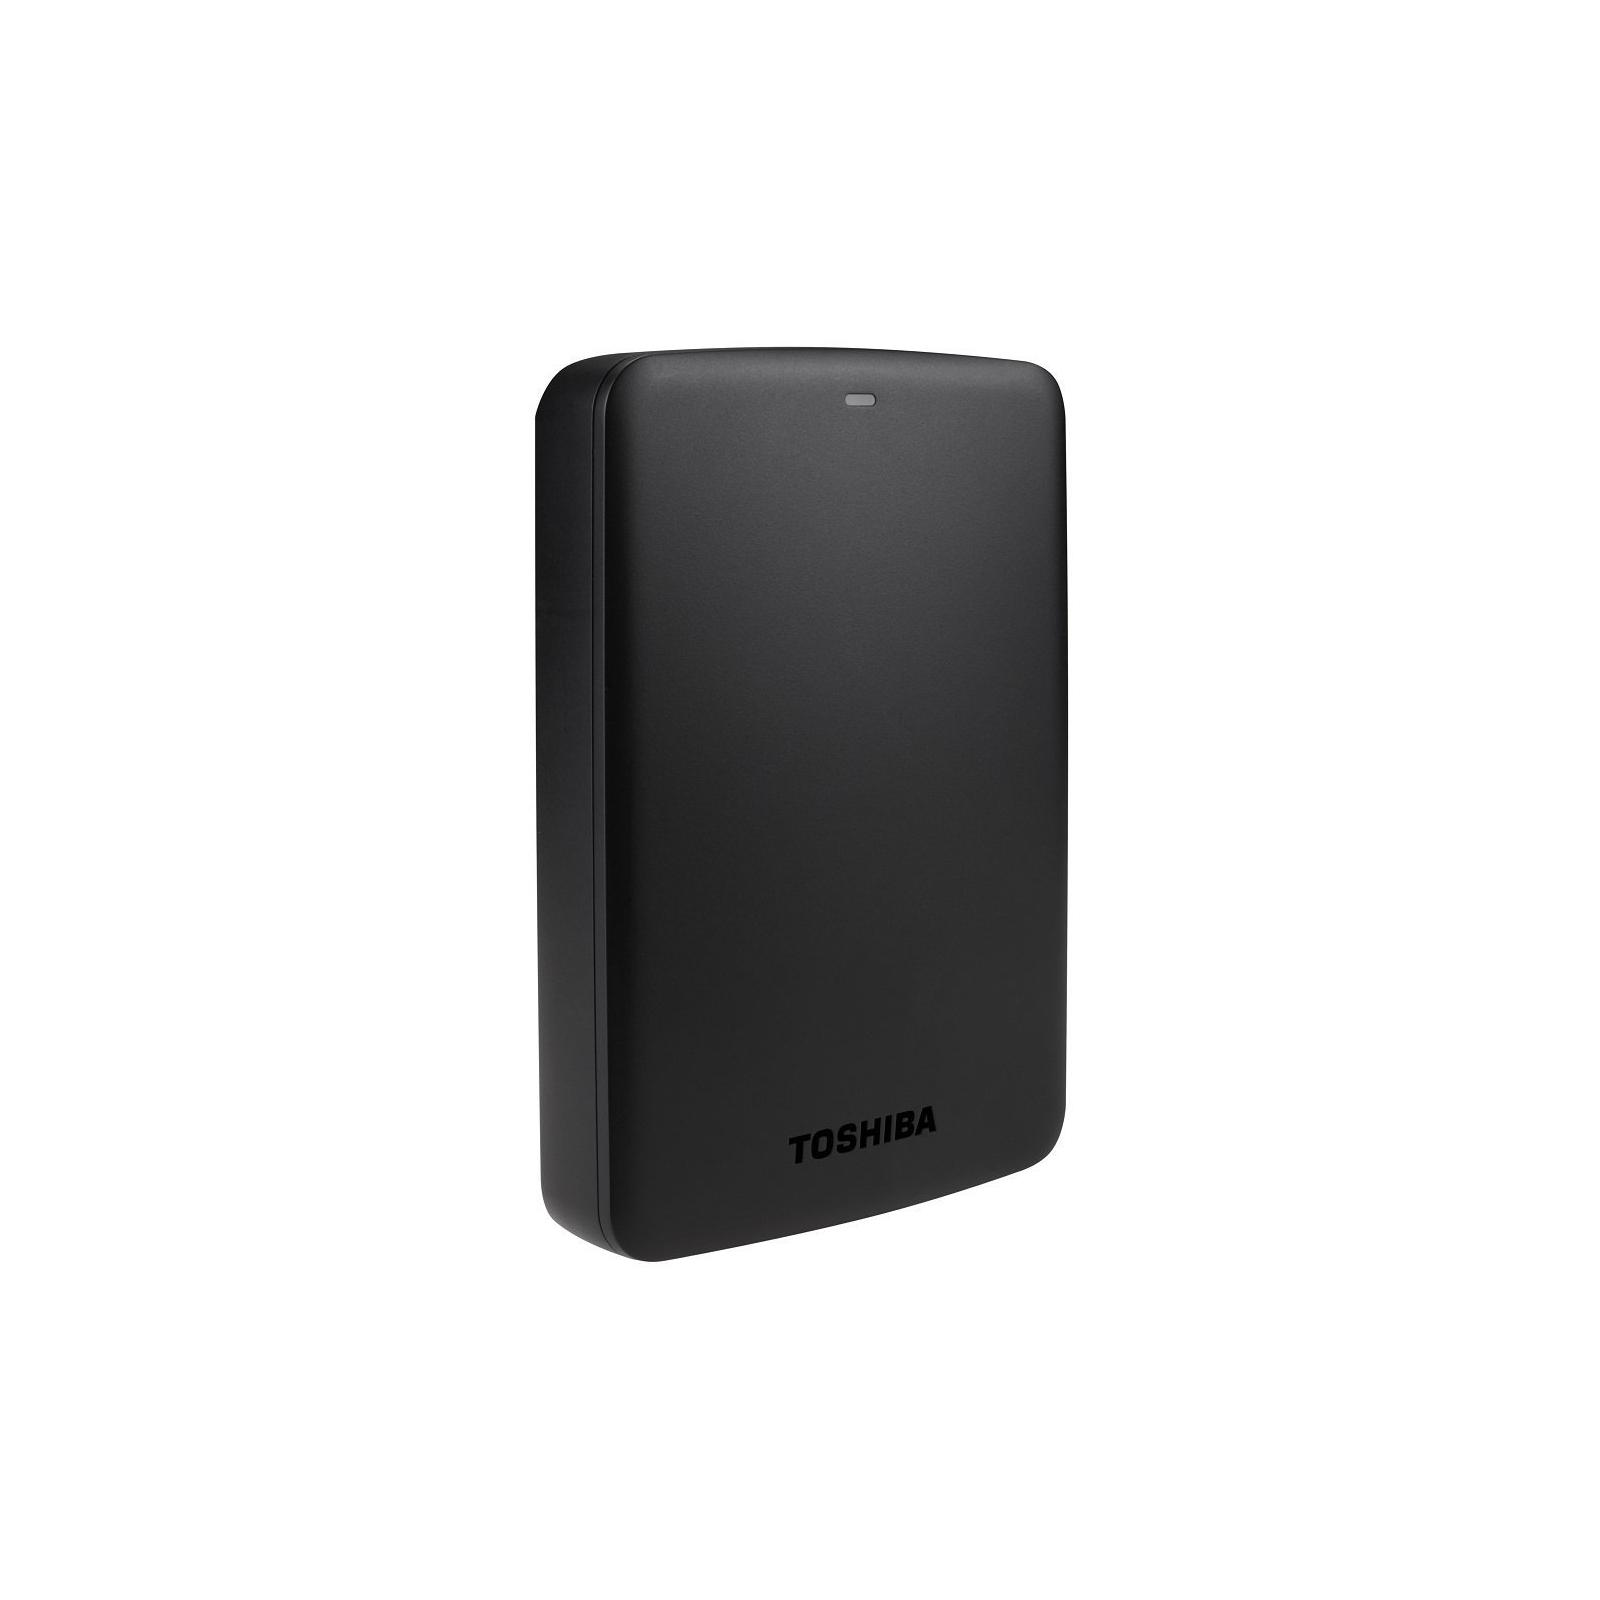 "Внешний жесткий диск 2.5"" 3TB TOSHIBA (HDTB330EK3CA)"